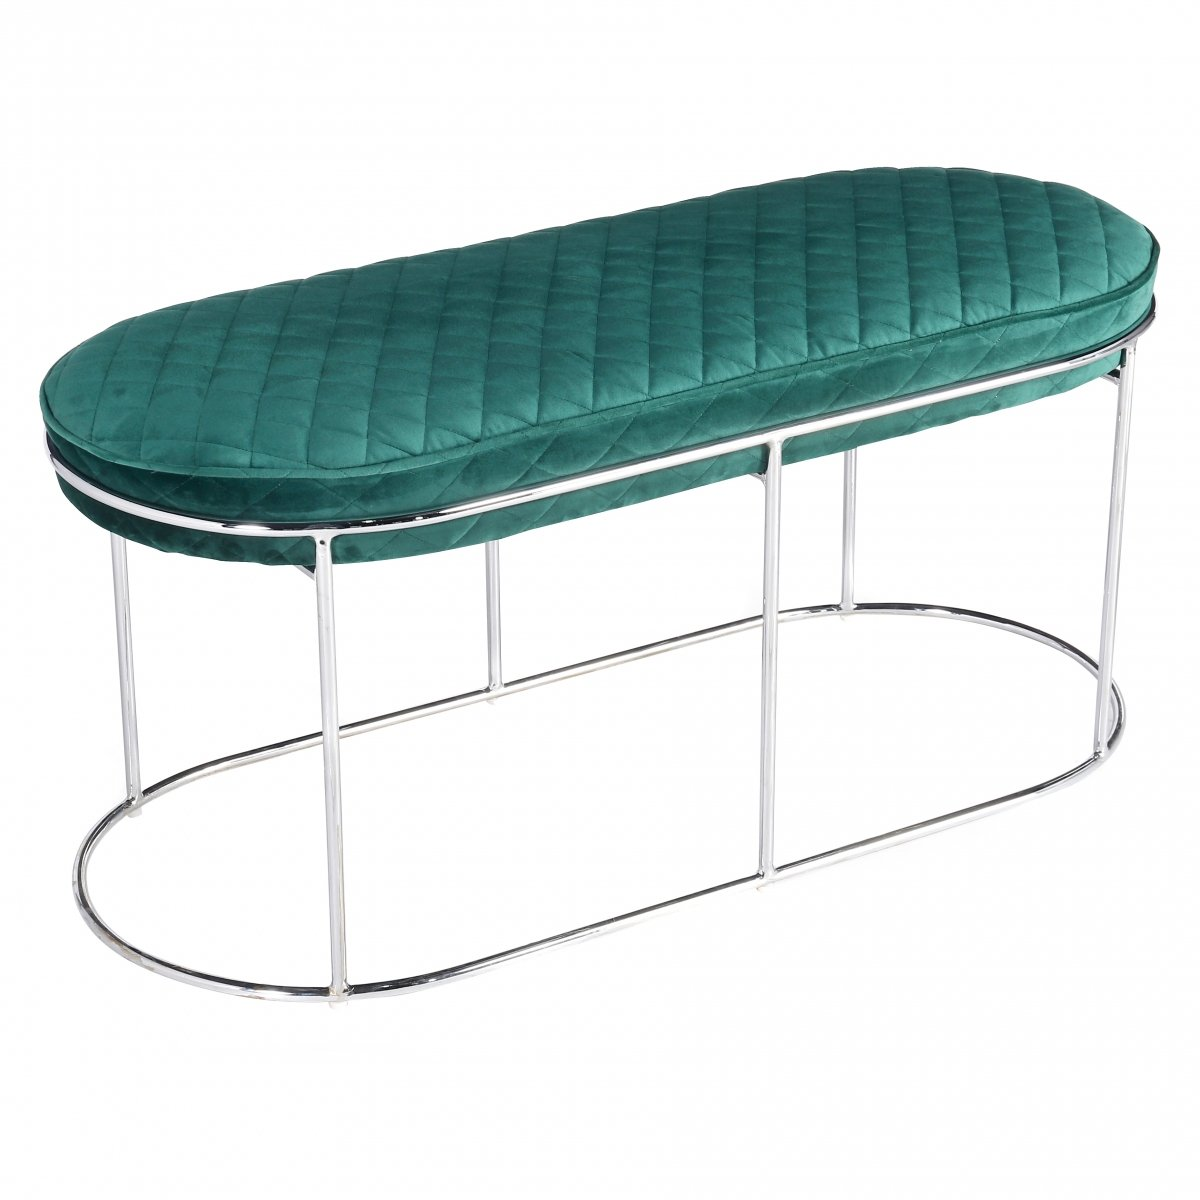 Банкетка Bench Emerald  - фото 1